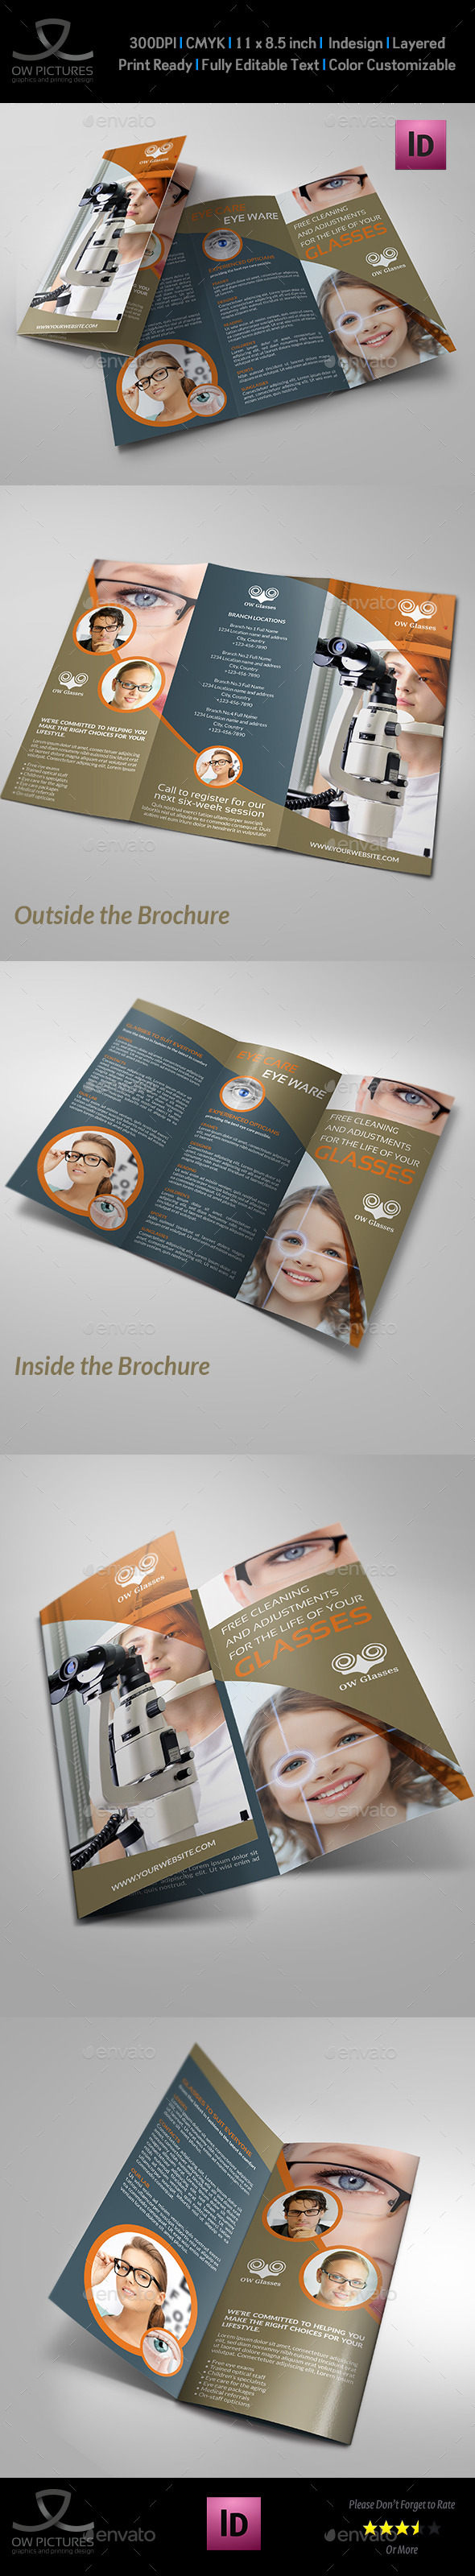 Optometrist & Optician Tri-Fold Brochure Vol.2 - Brochures Print Templates